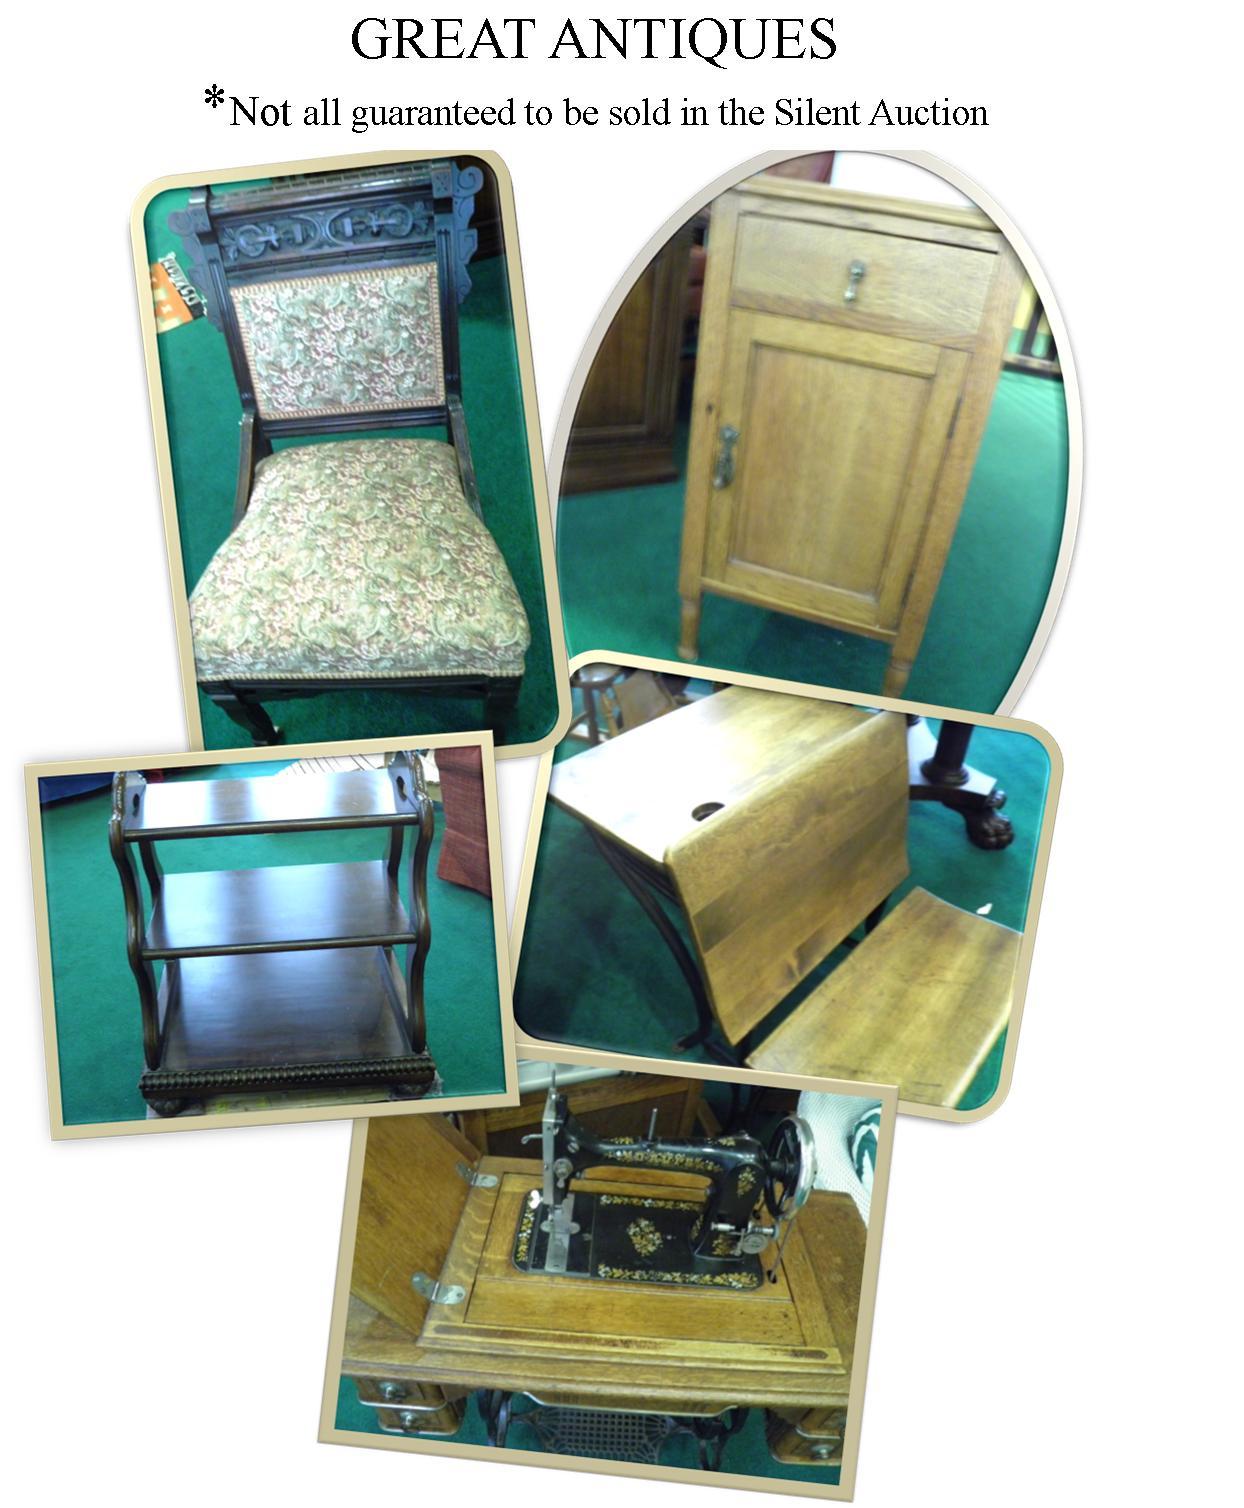 fall bazaar featured items 2014 booneumc. Black Bedroom Furniture Sets. Home Design Ideas